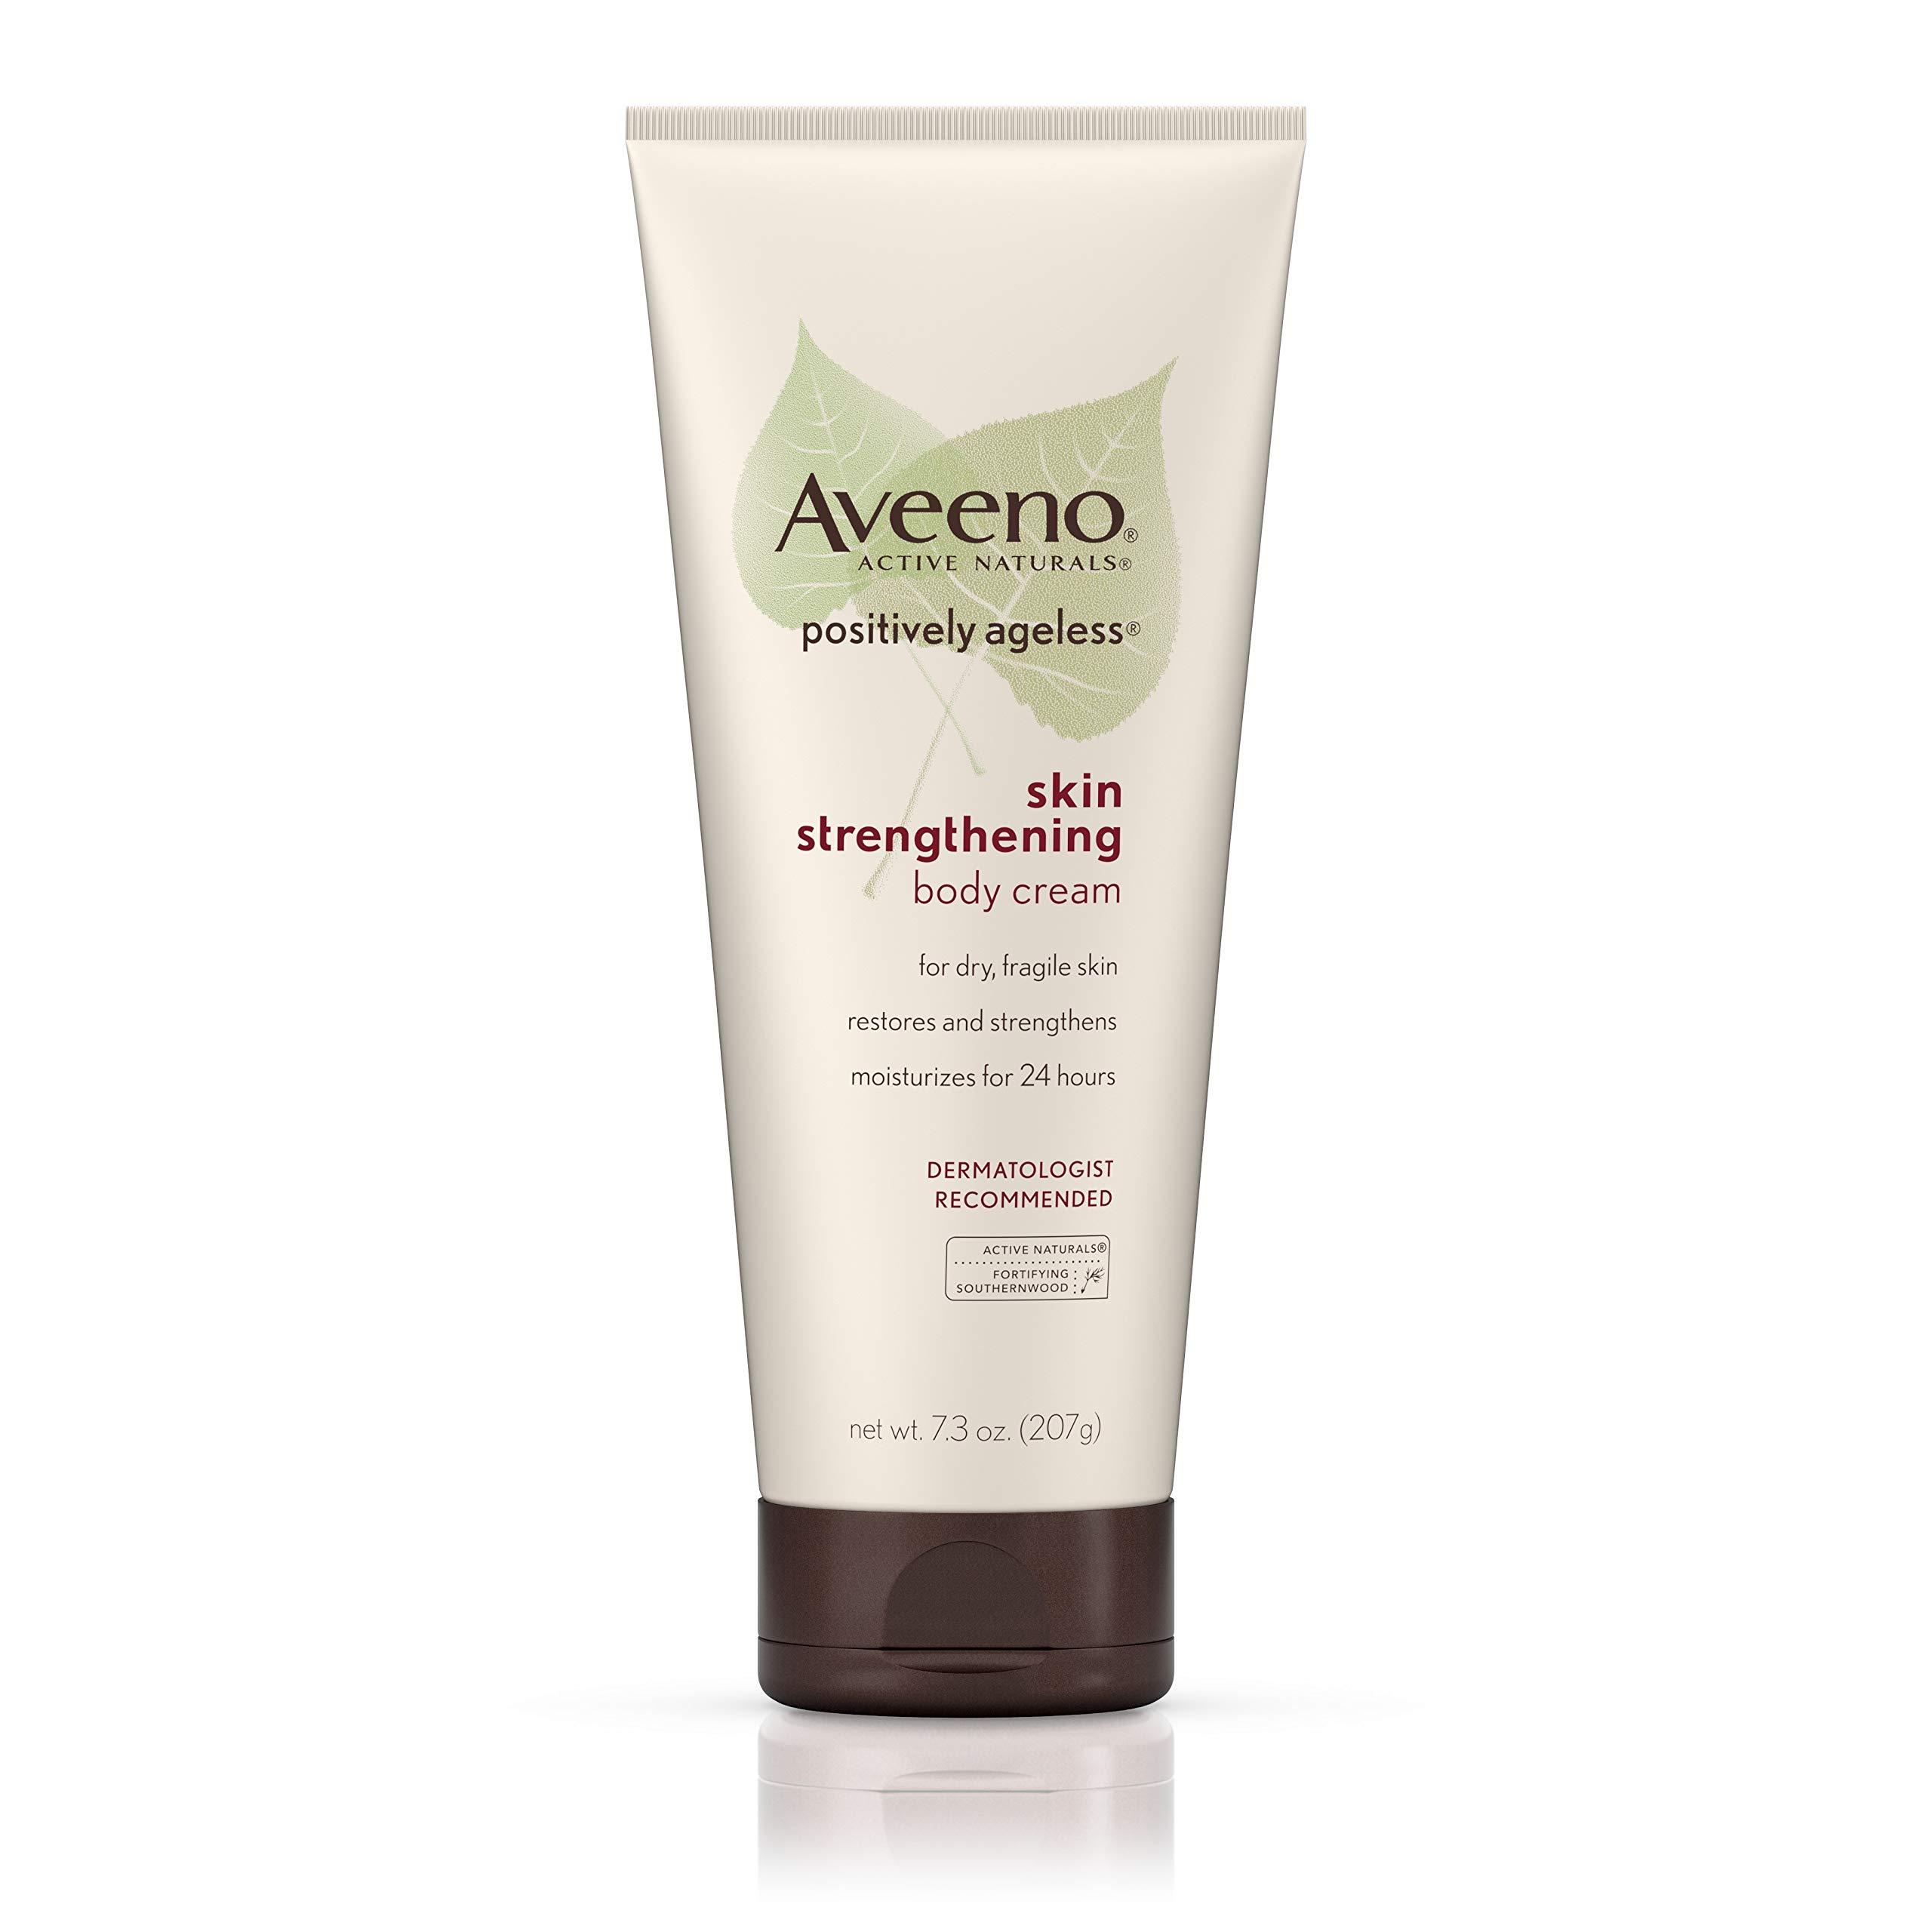 Aveeno Positively Ageless Skin Strengthening Body Cream, Moisturizes For 24 Hours 7.3 Oz by Aveeno